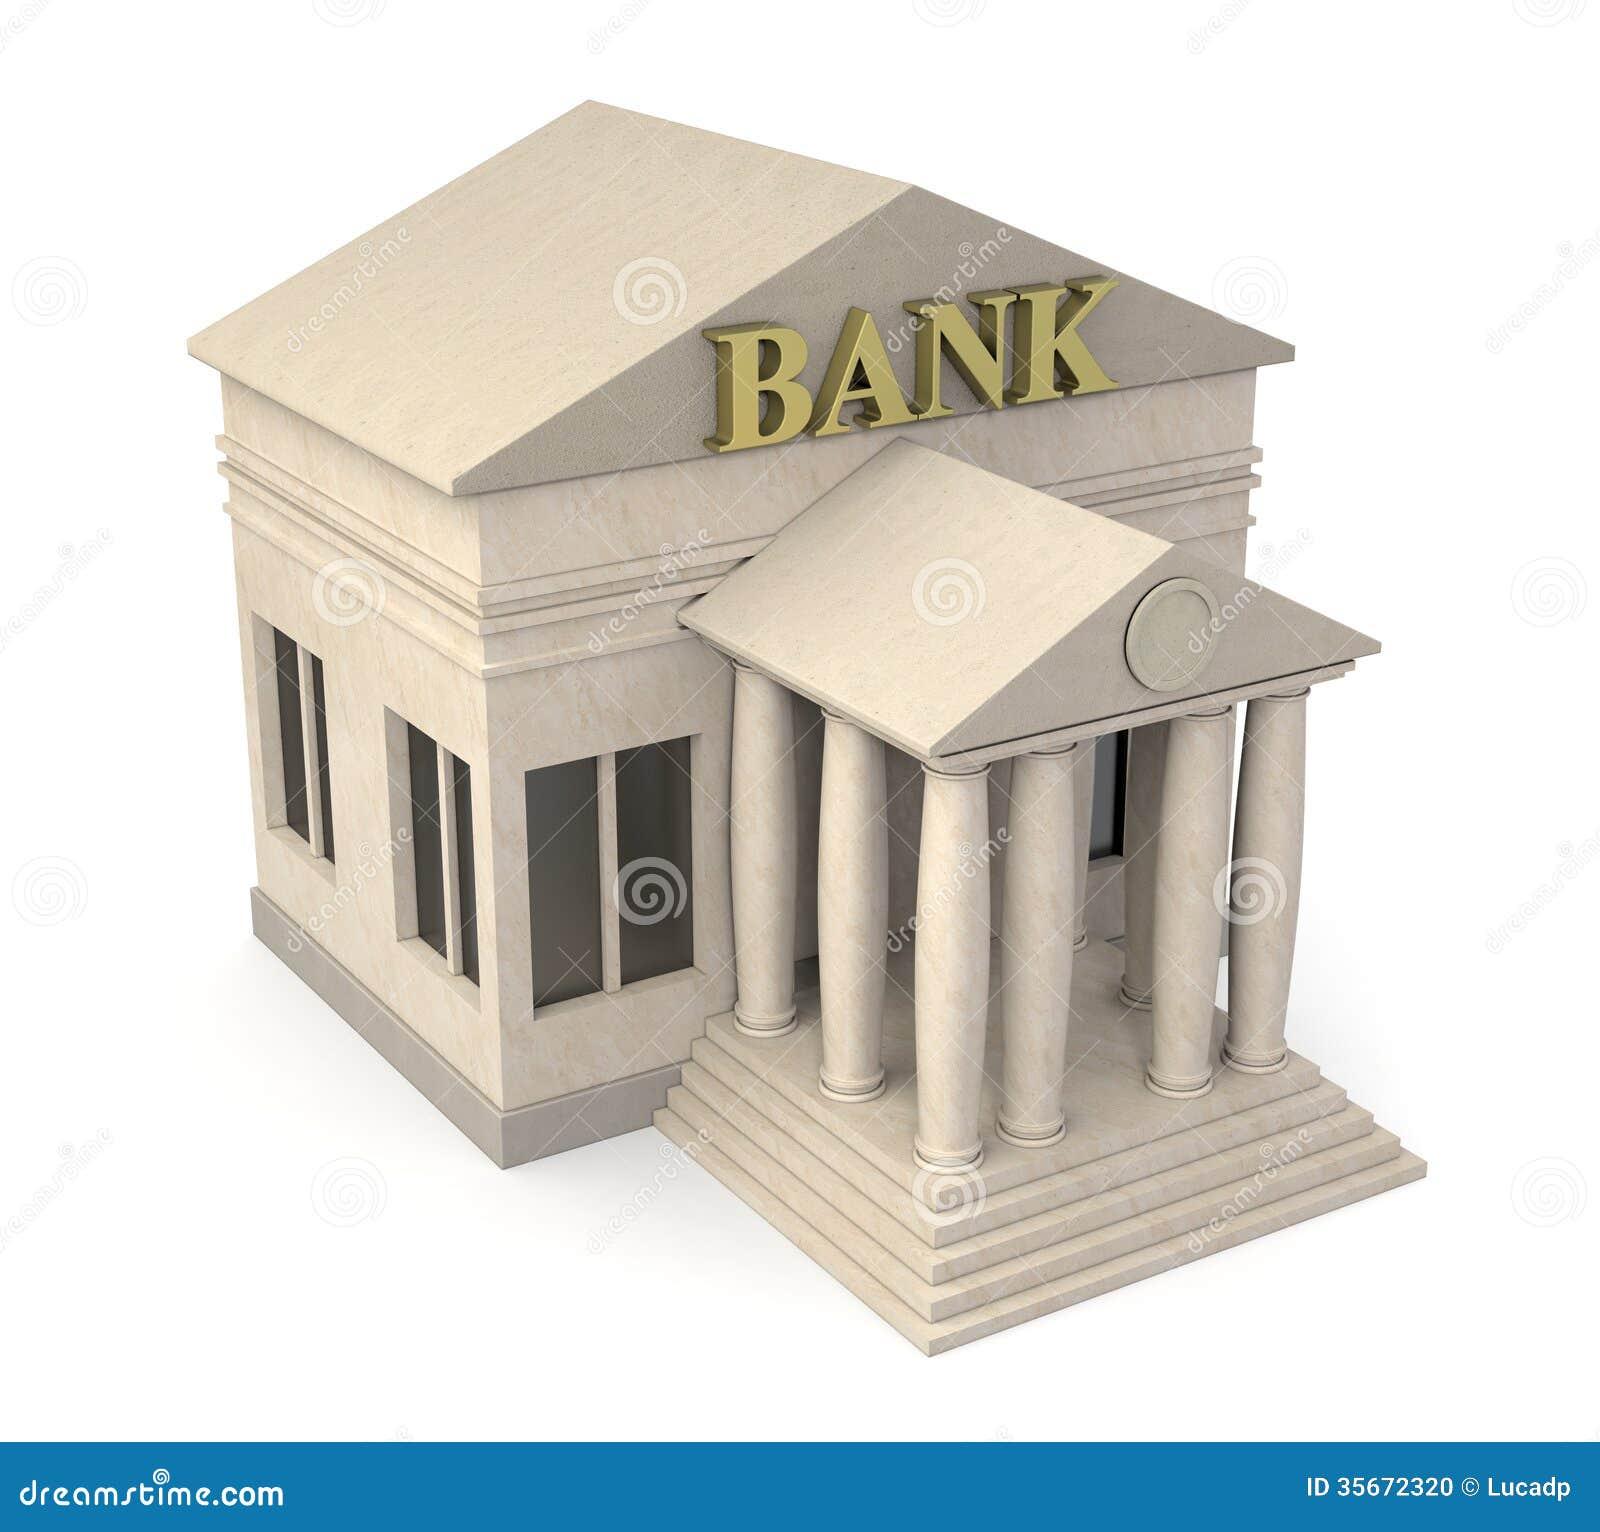 Bank Building Stock Photo Image 35672320